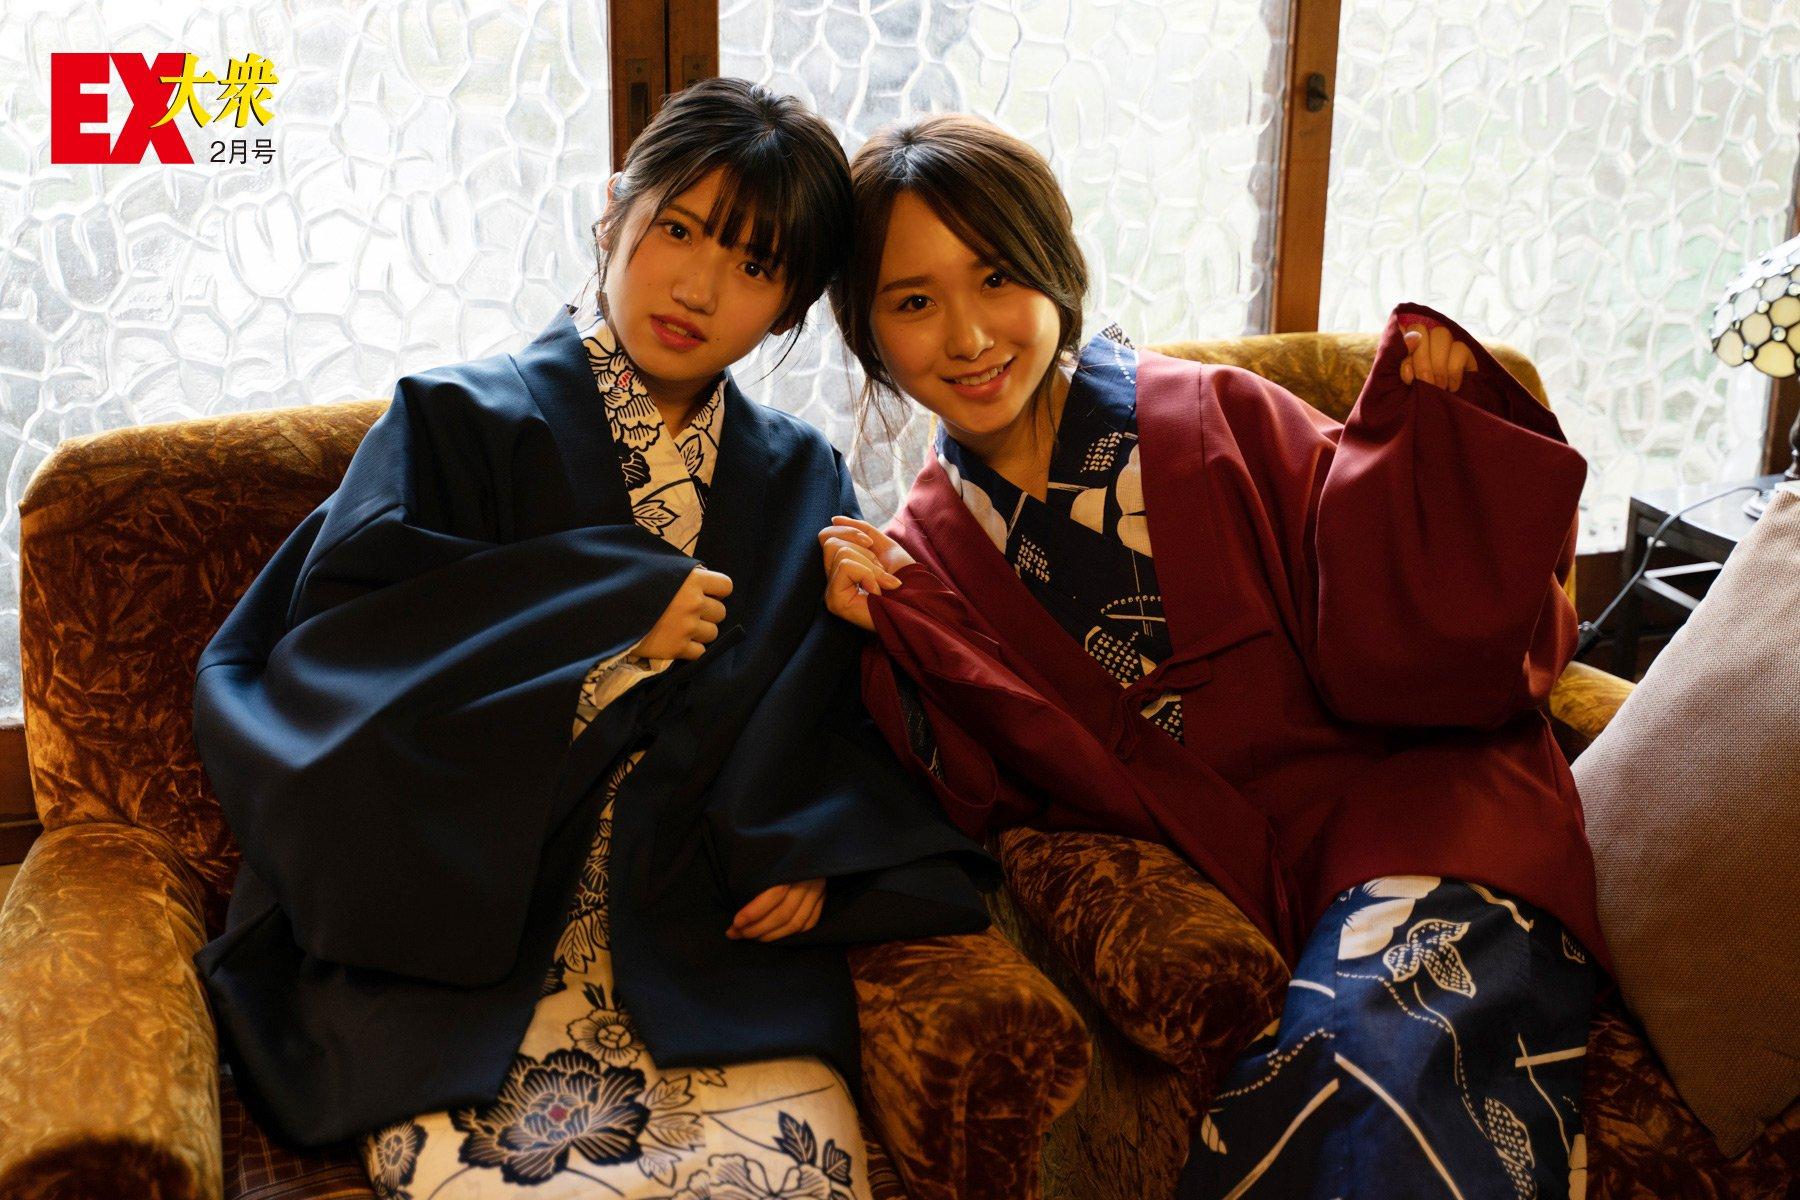 AKB48高橋朱里&村山彩希の本誌未掲載カット9枚を大公開!【EX大衆2月号】の画像006